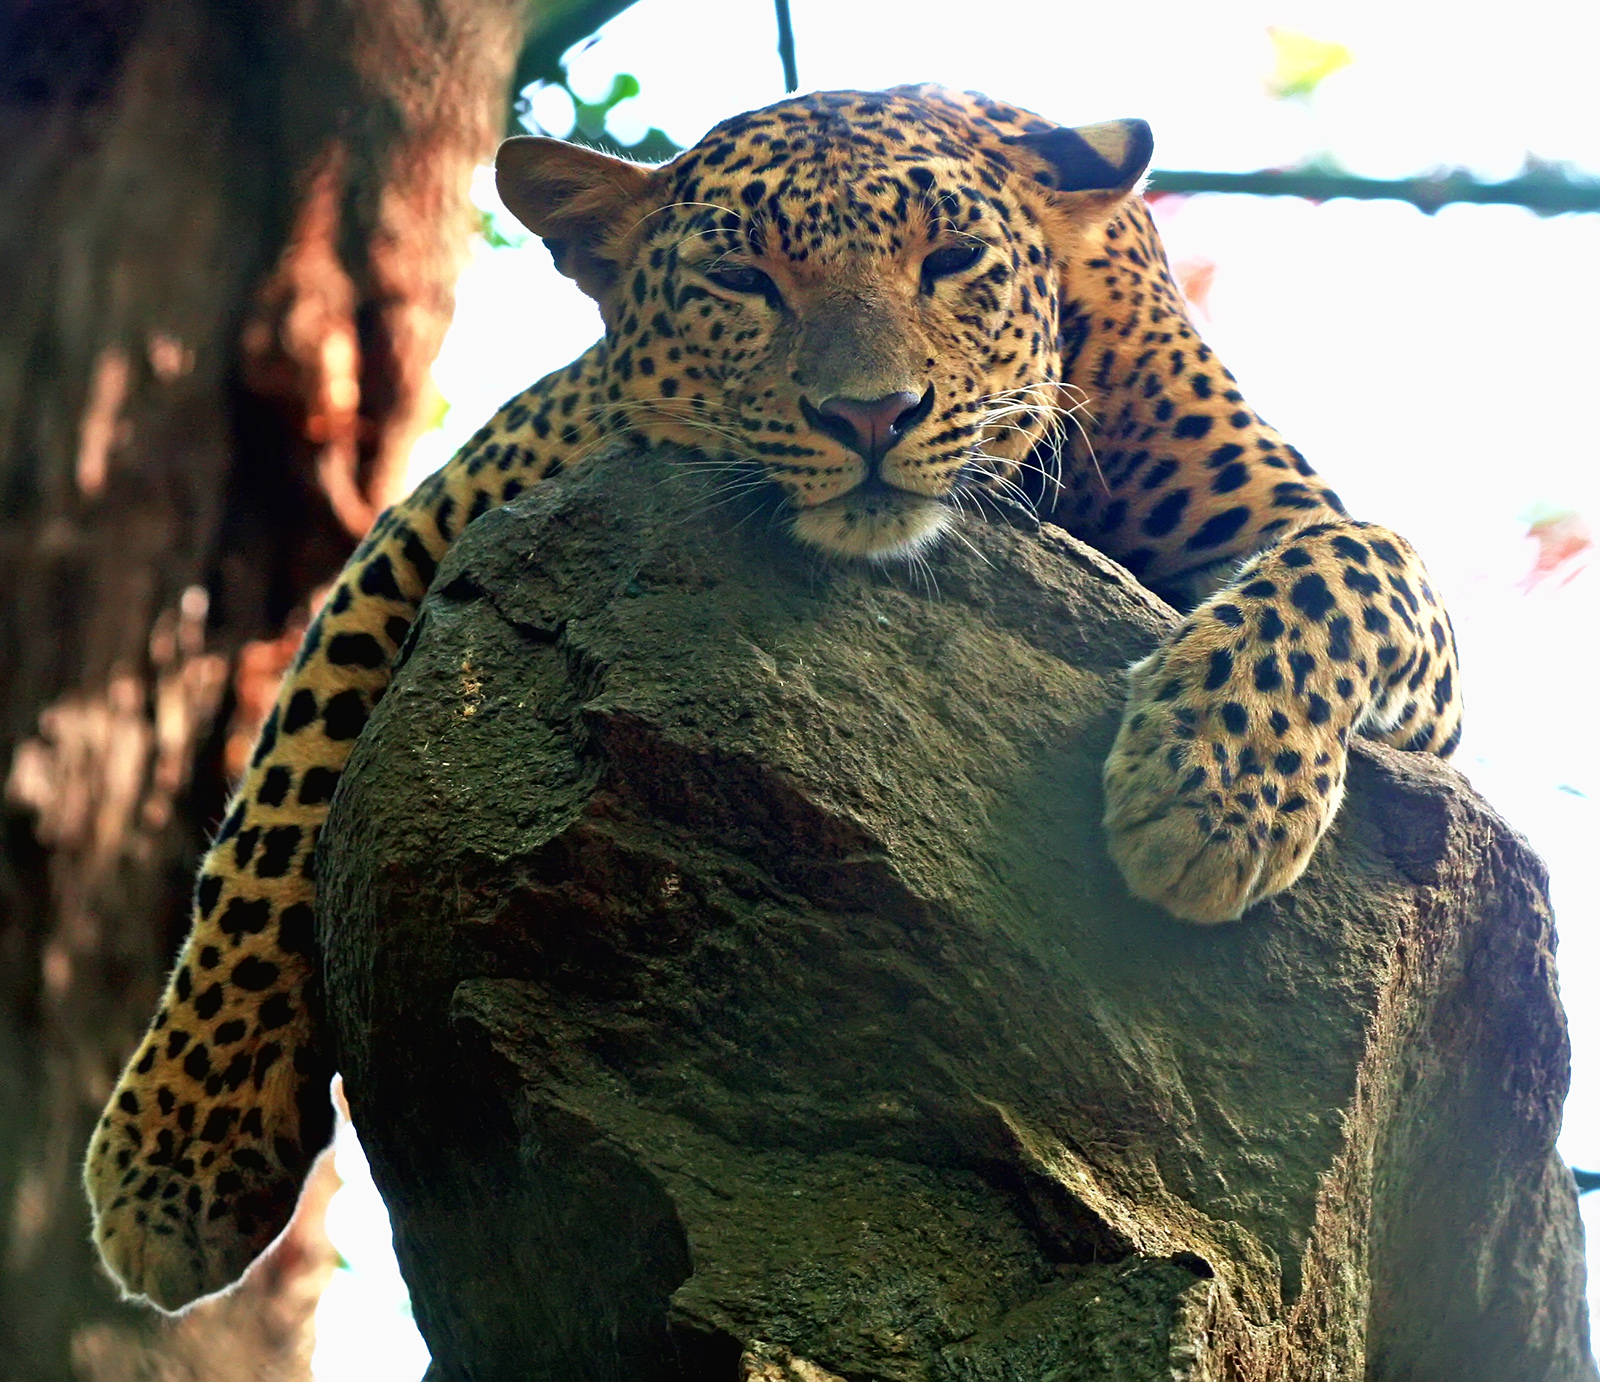 Soubor:Leopard.jpg